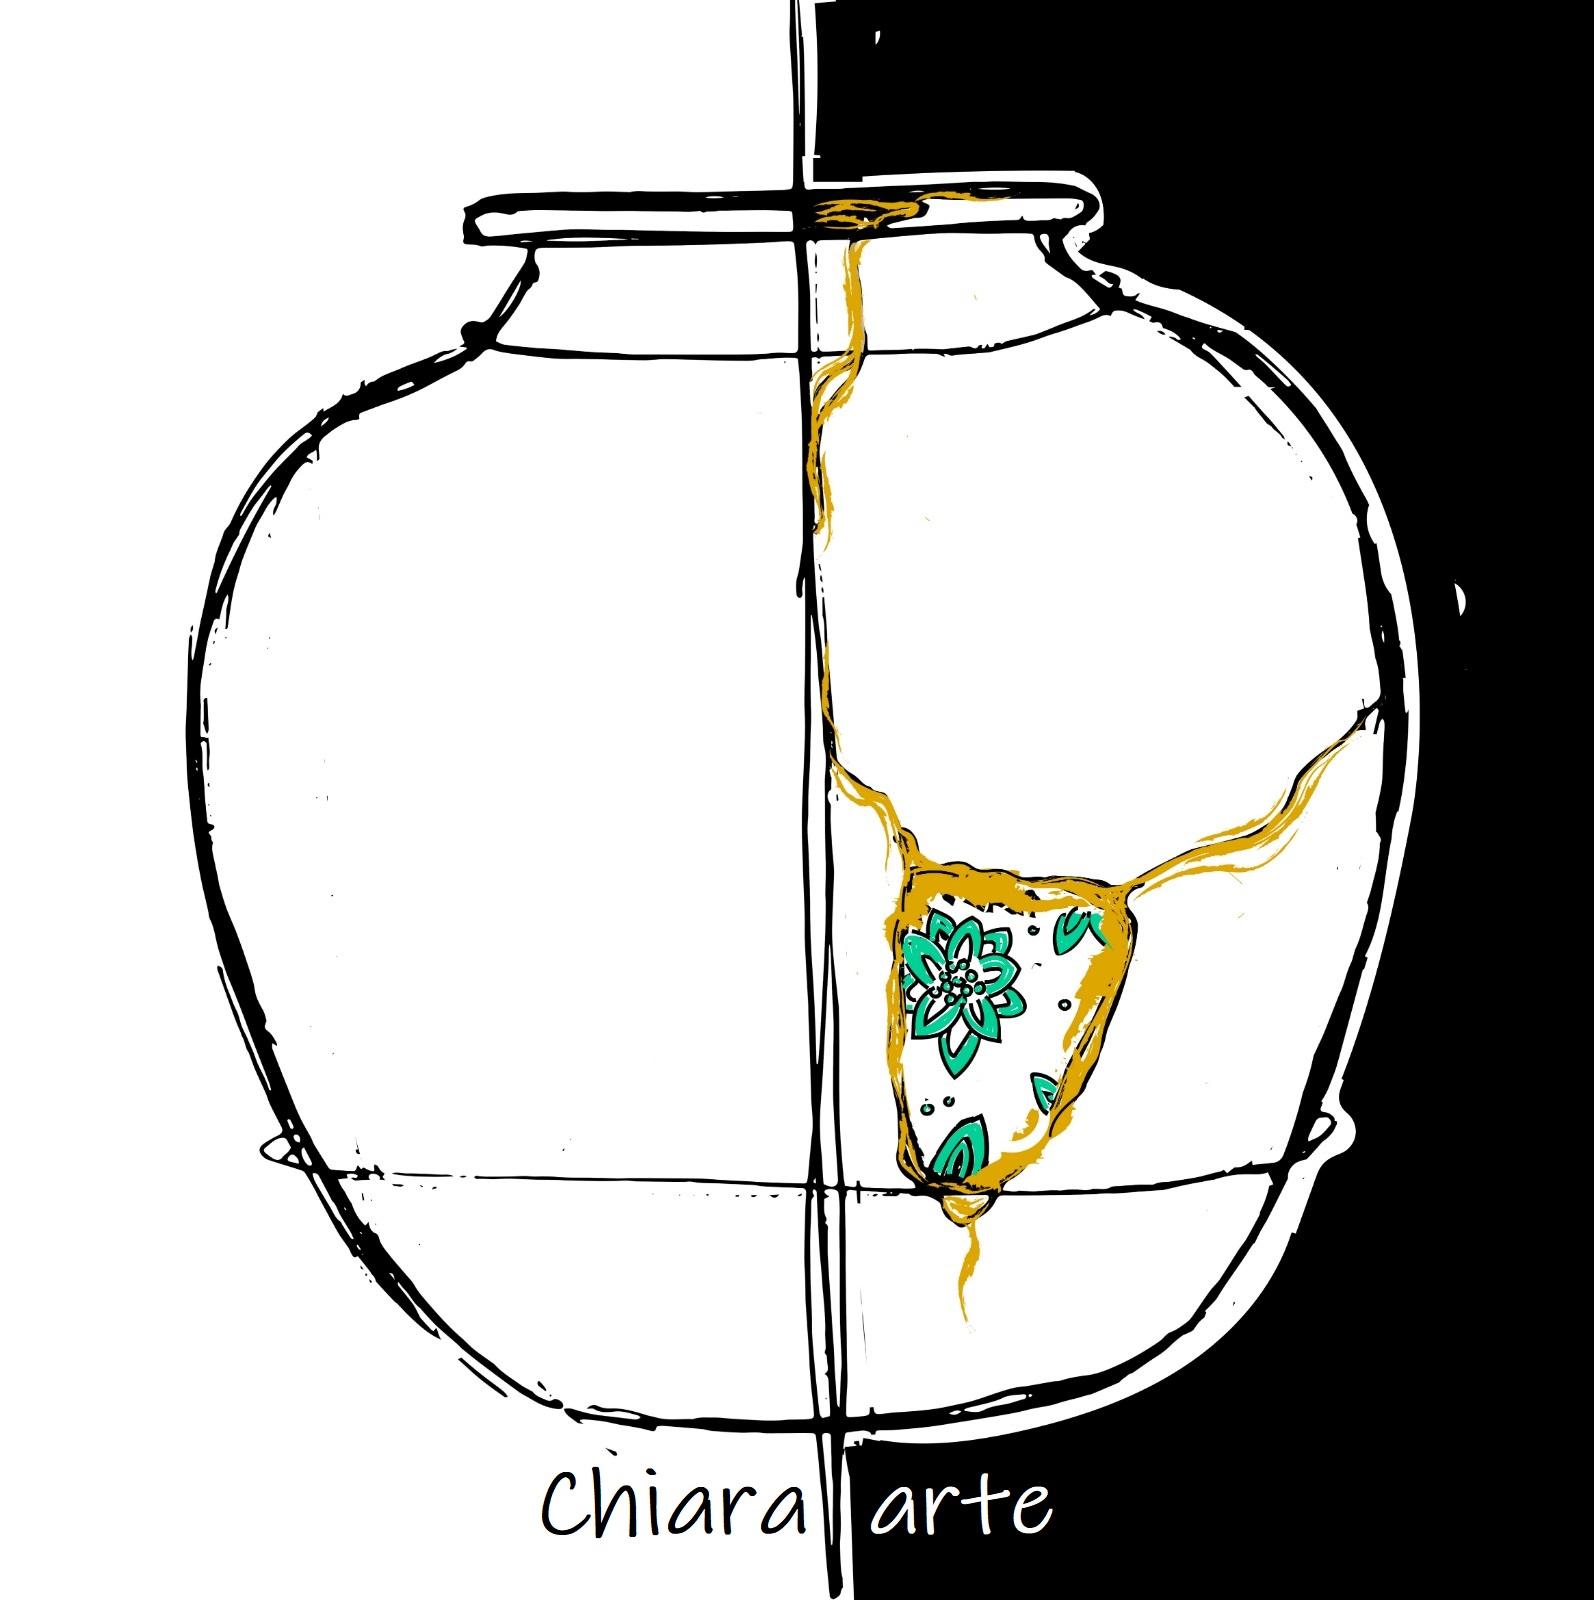 Kintsugi Chiaraarte